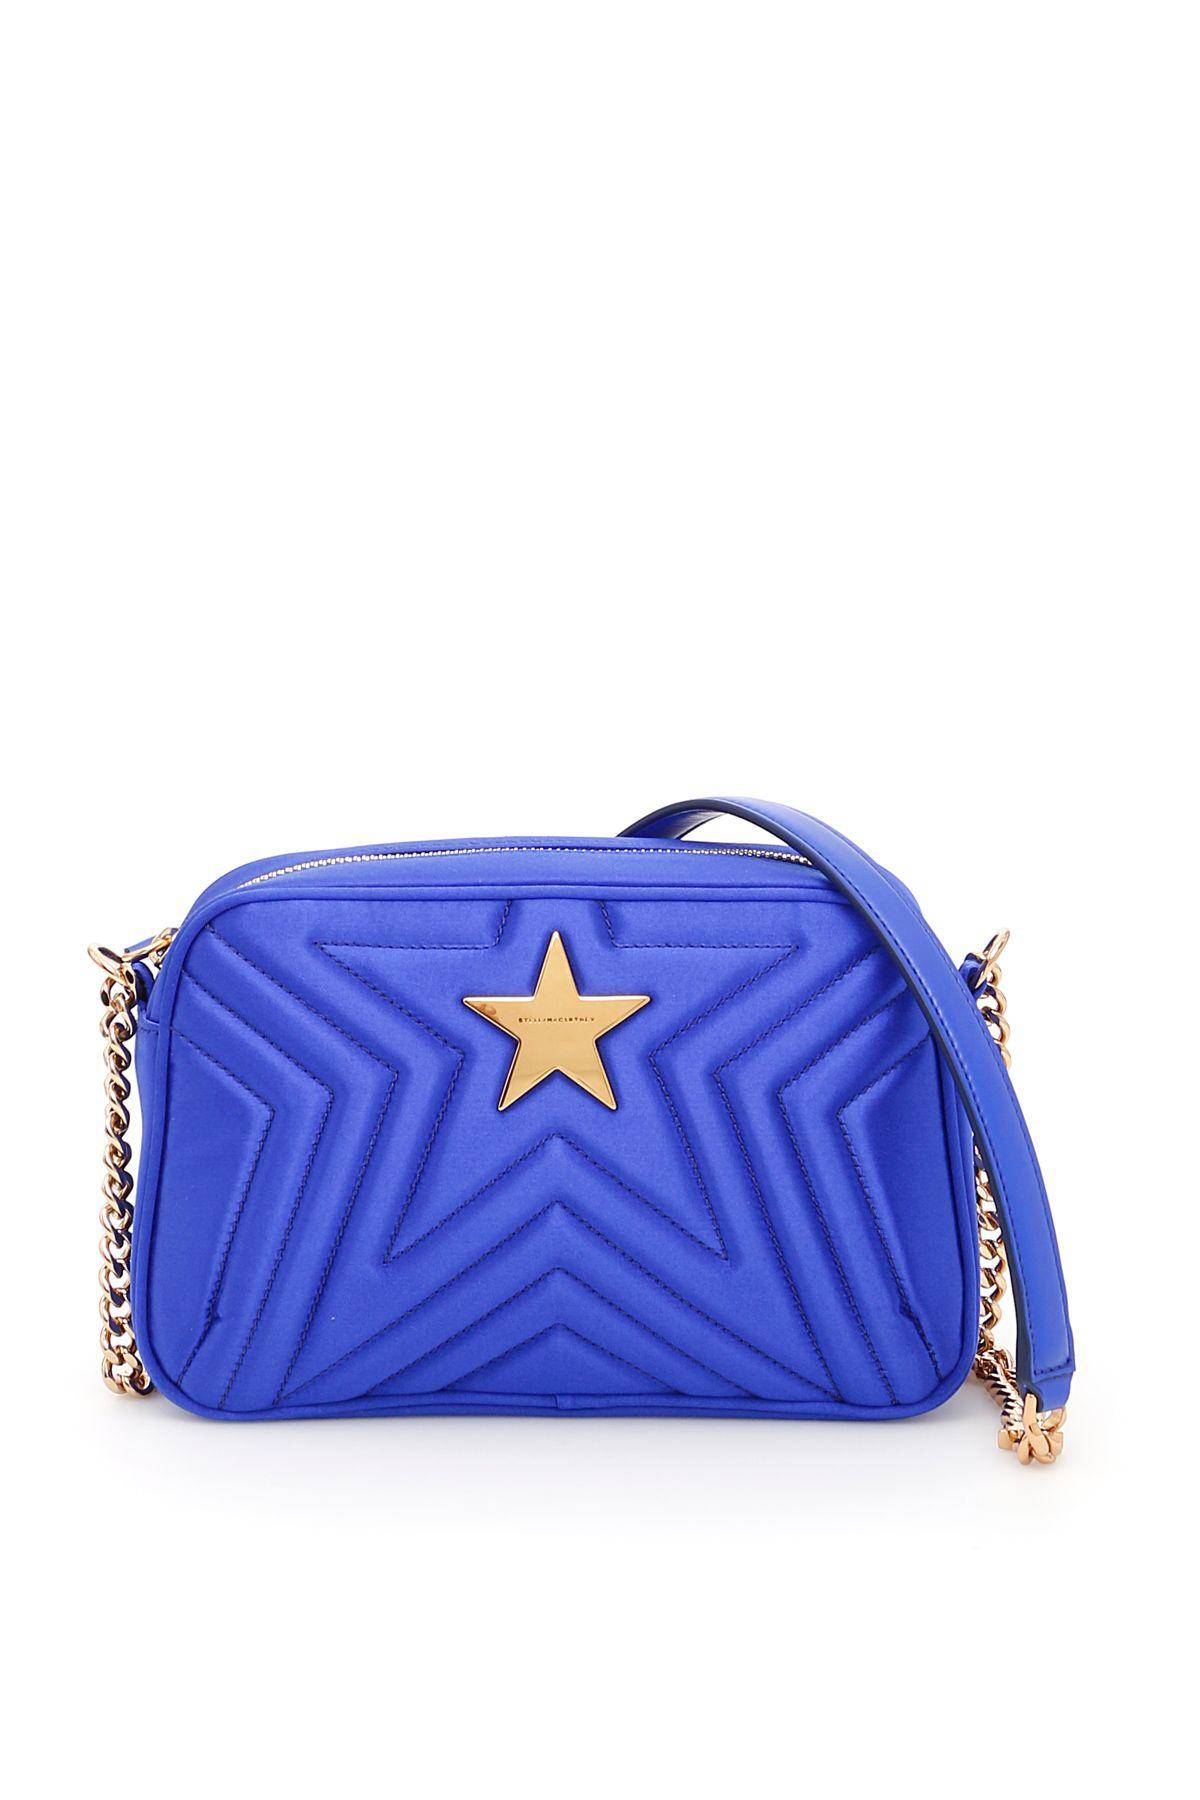 2690527c3f74 Stella McCartney - Quilted Satin Stella Star Bag